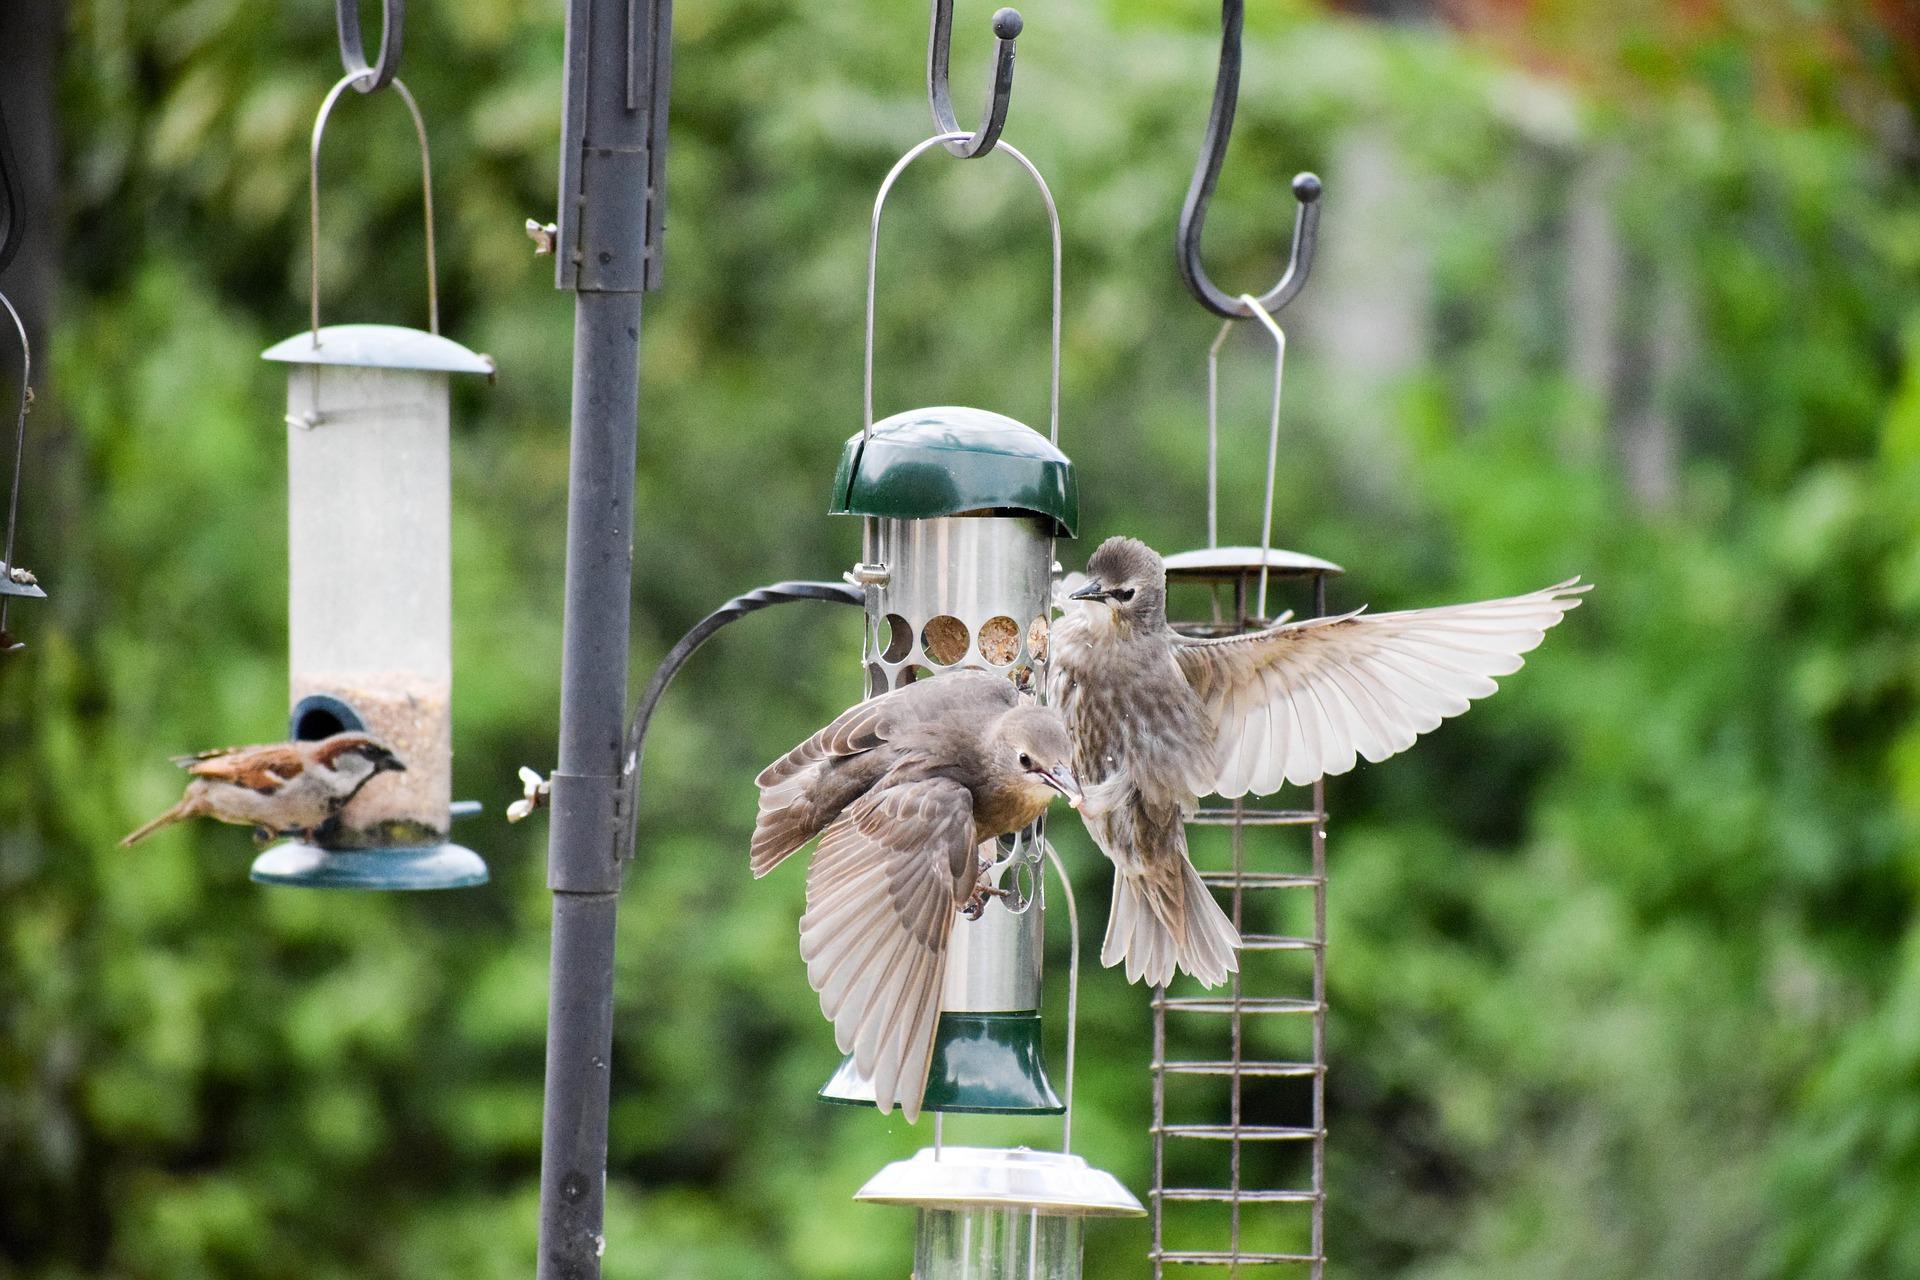 Feeding those poor birds